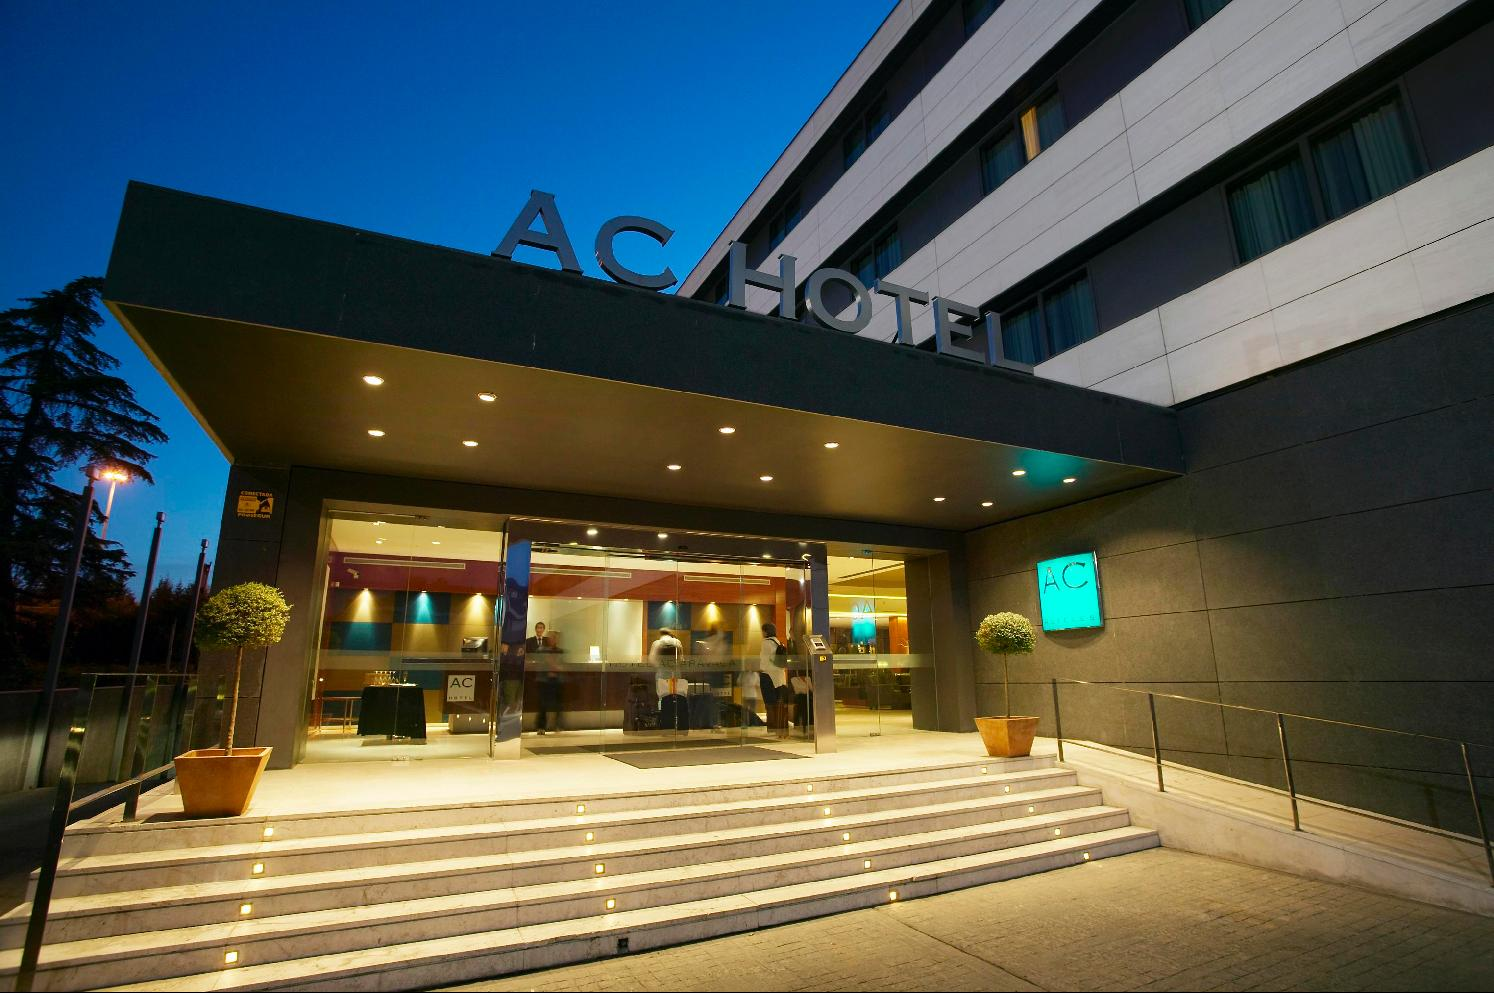 Ofertas de hoteles baratos para este fin de semana en madrid for Hoteles bonitos madrid